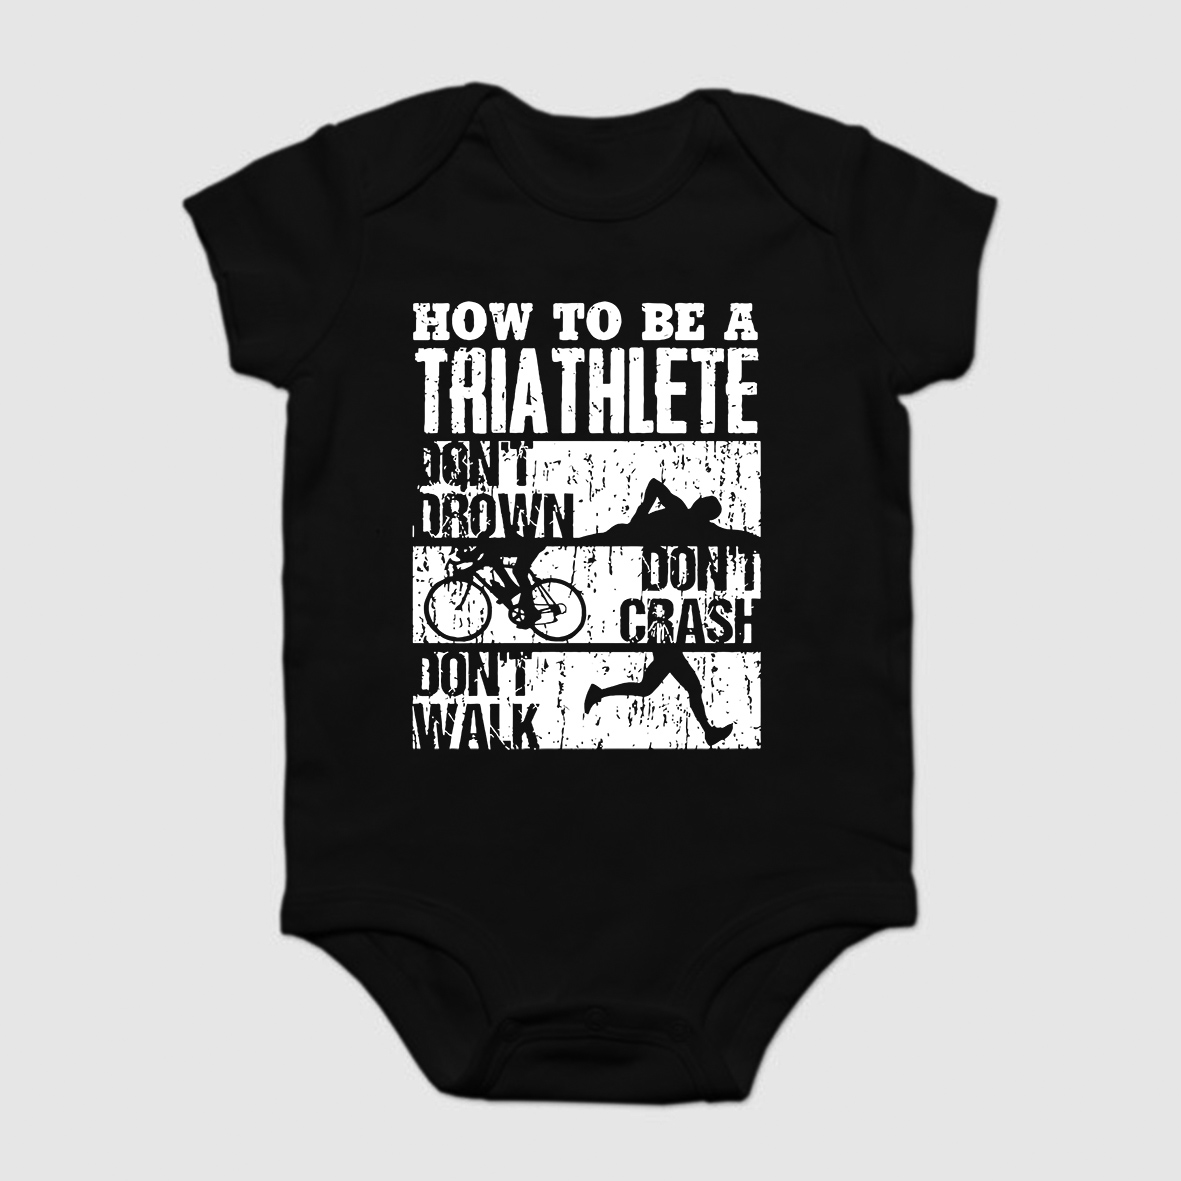 fb956ae8c Baby Onesie Baby Bodysuits kid t shirt Funny novelty Triathlon - Funny  Triathlon For the BEST